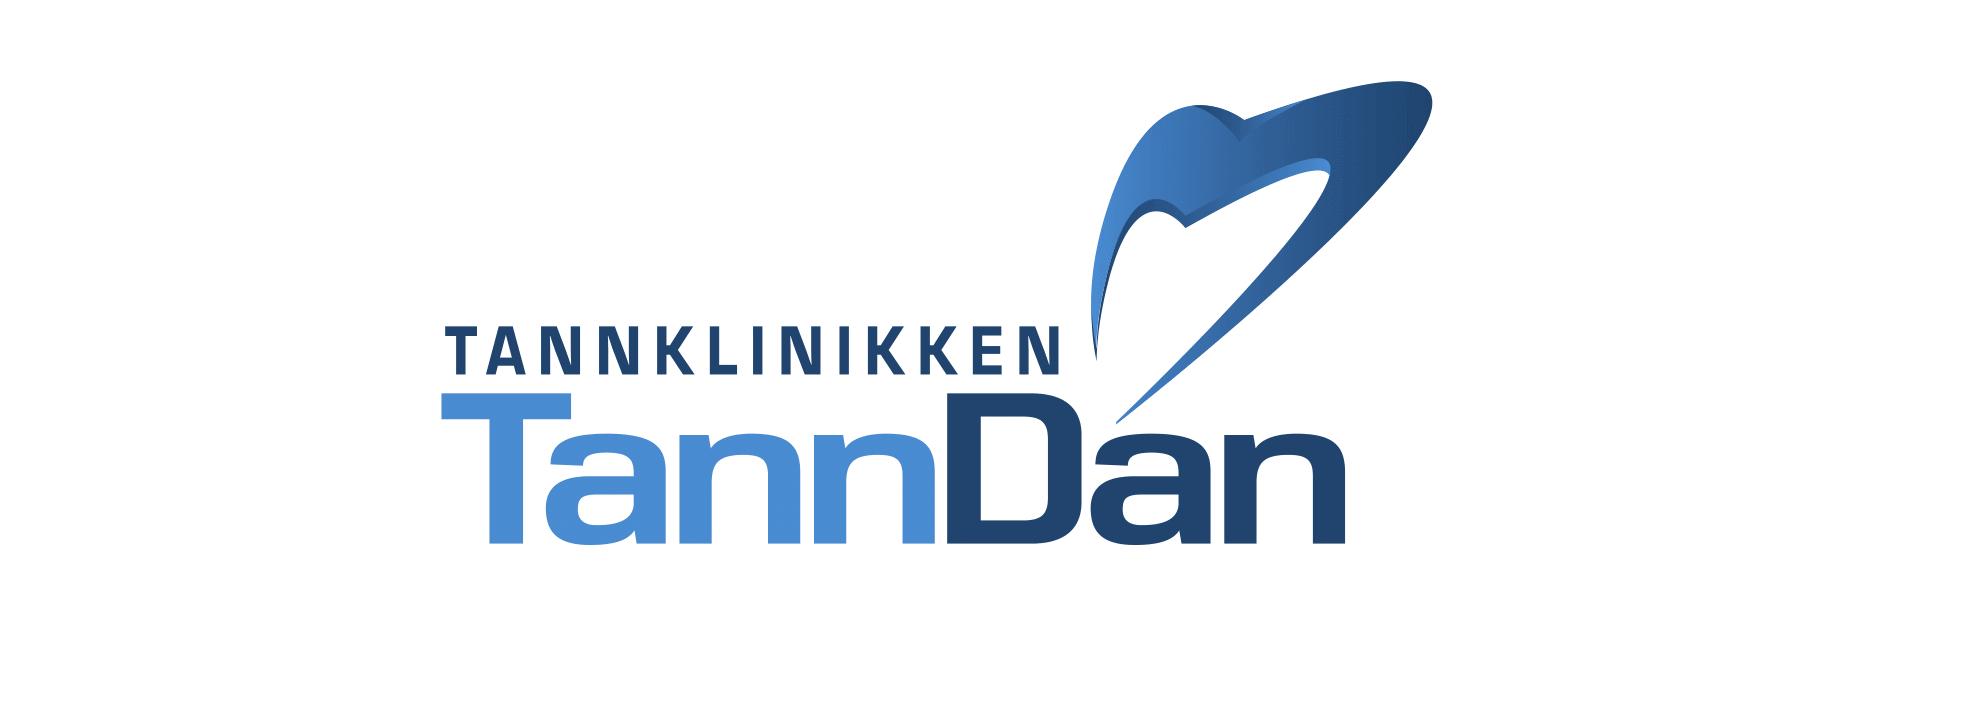 Tannklinikken TannDan logo